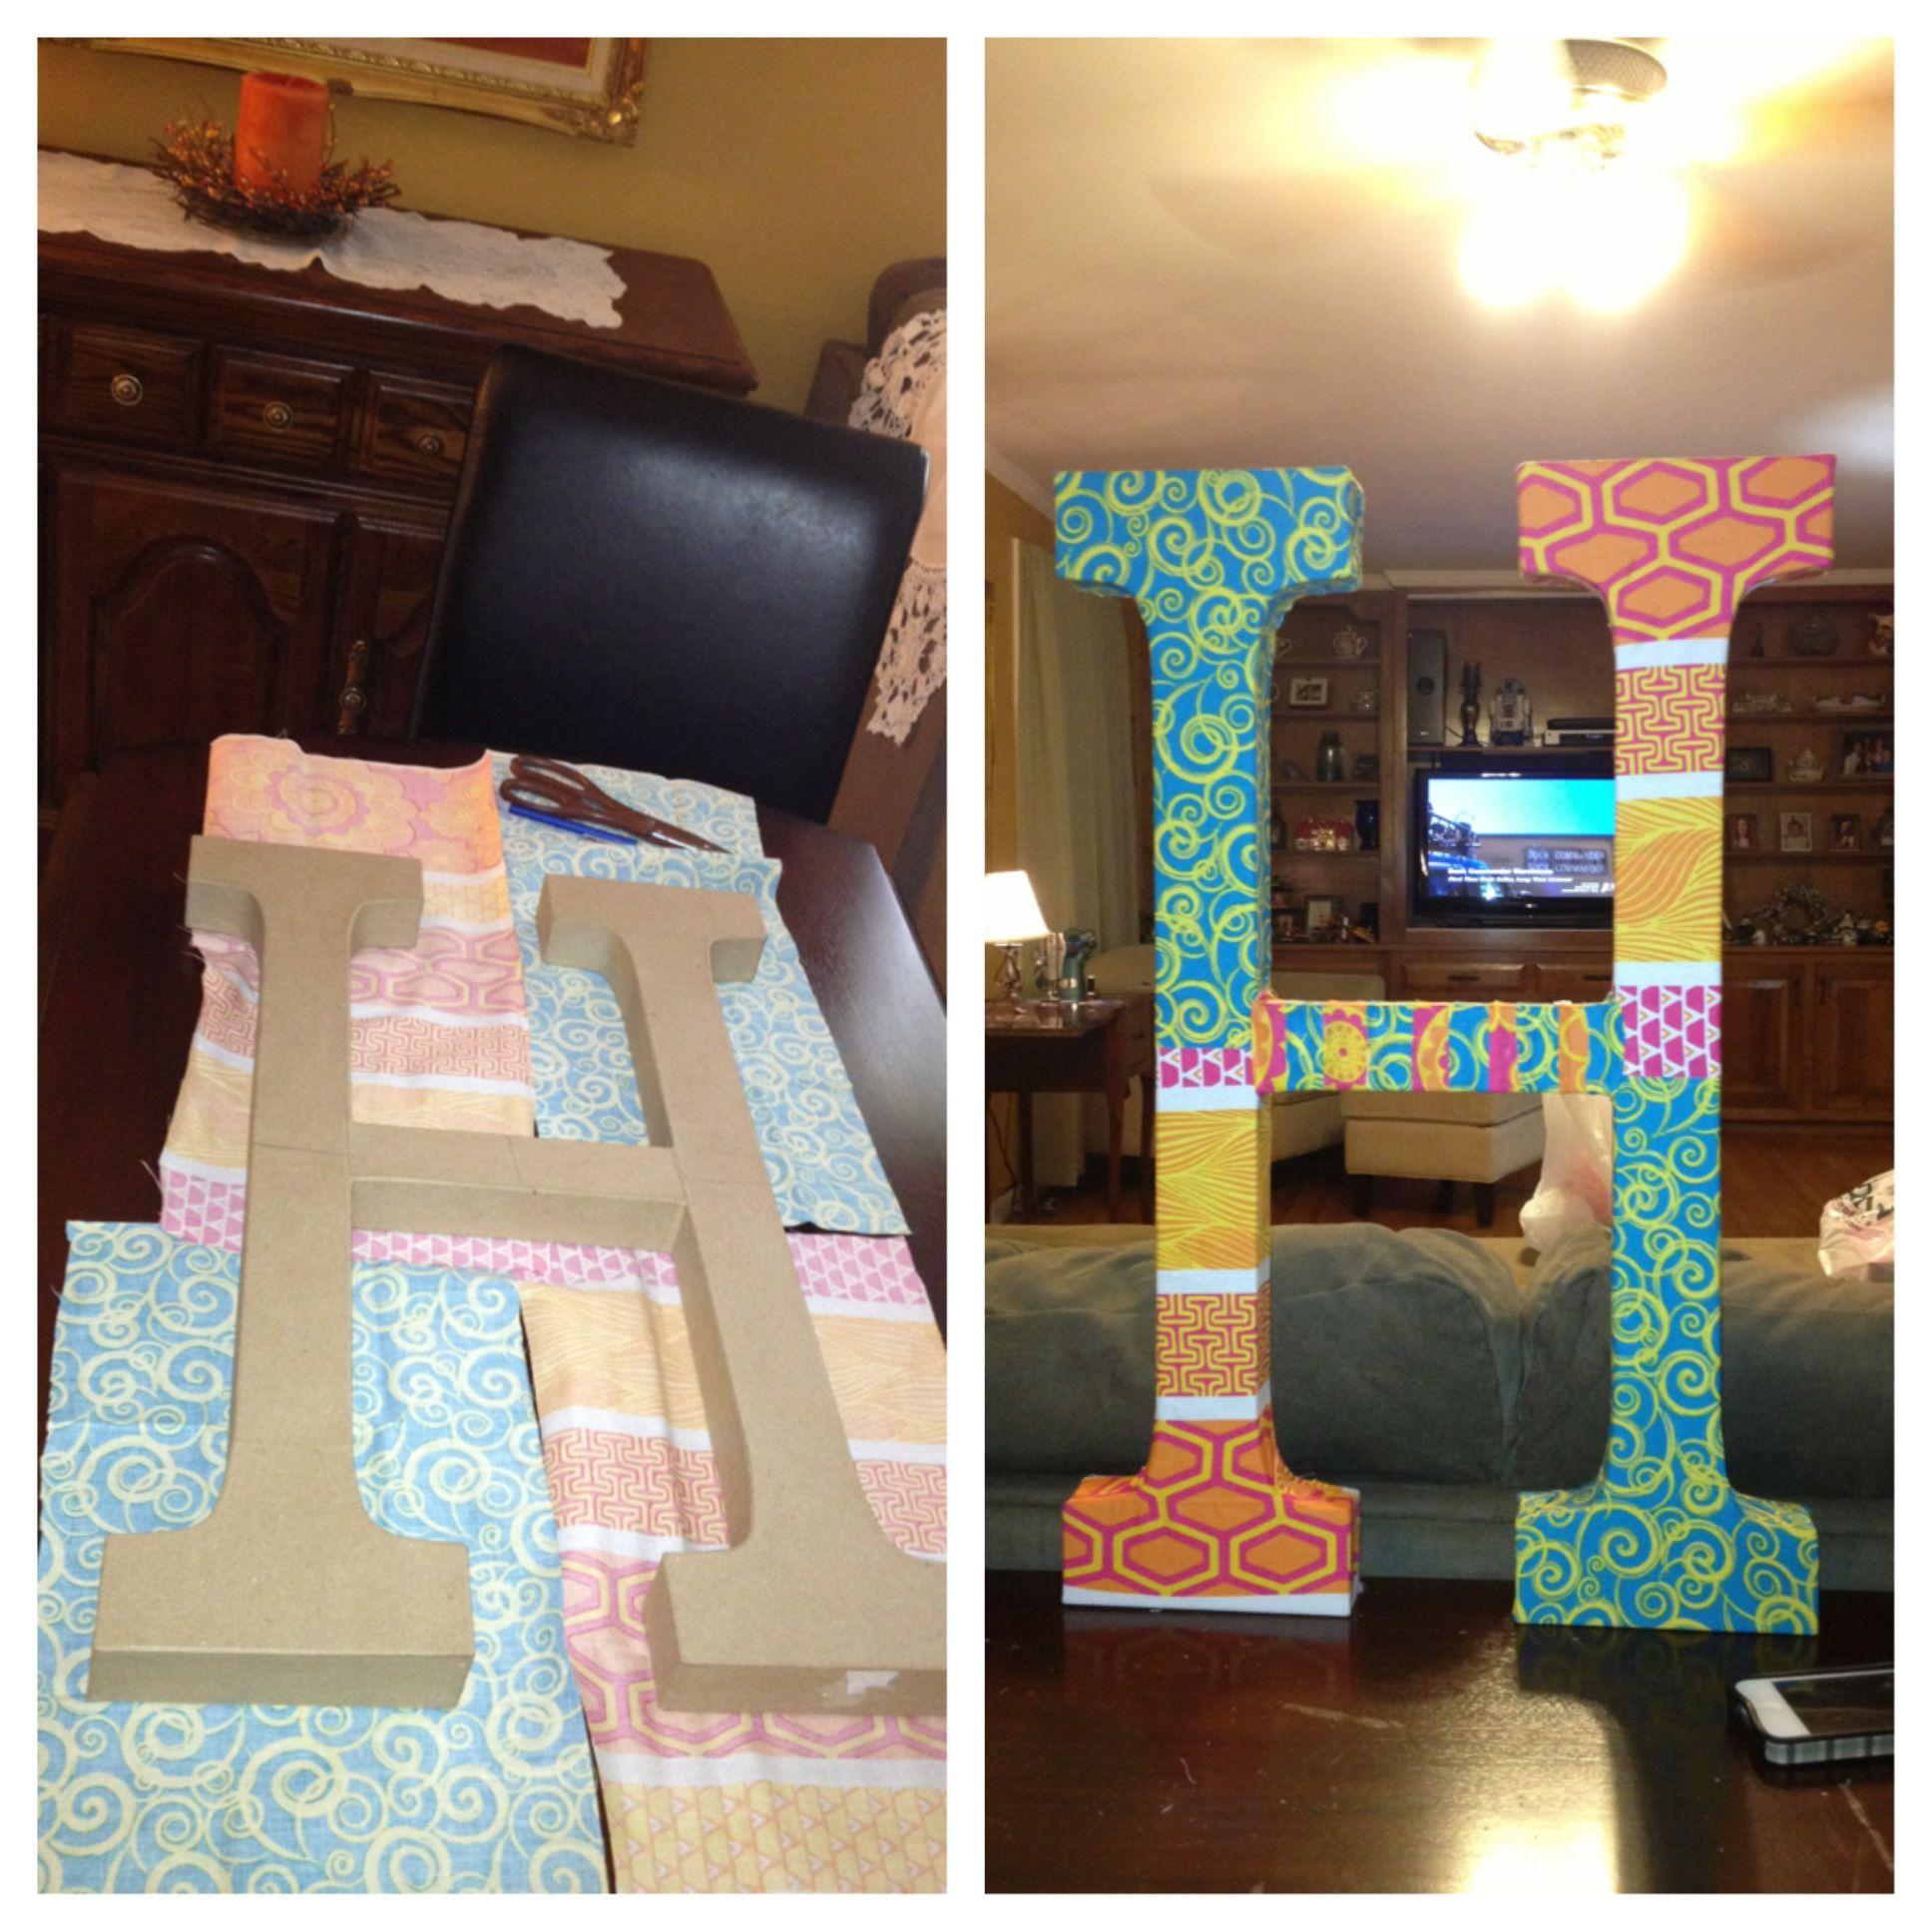 Dorm decor!! DIY | Dorm room crafts, Dorm crafts, College ...